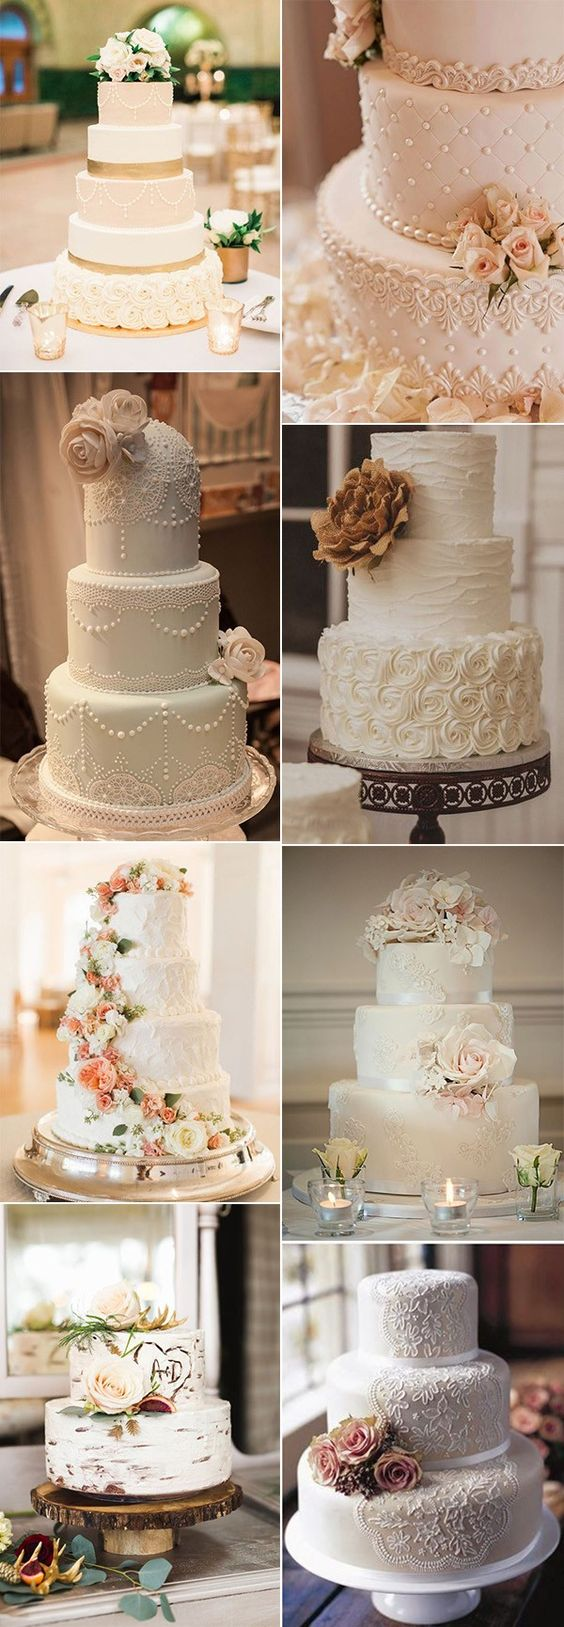 Wedding cake con milonas wedding photos pinterest wedding cake